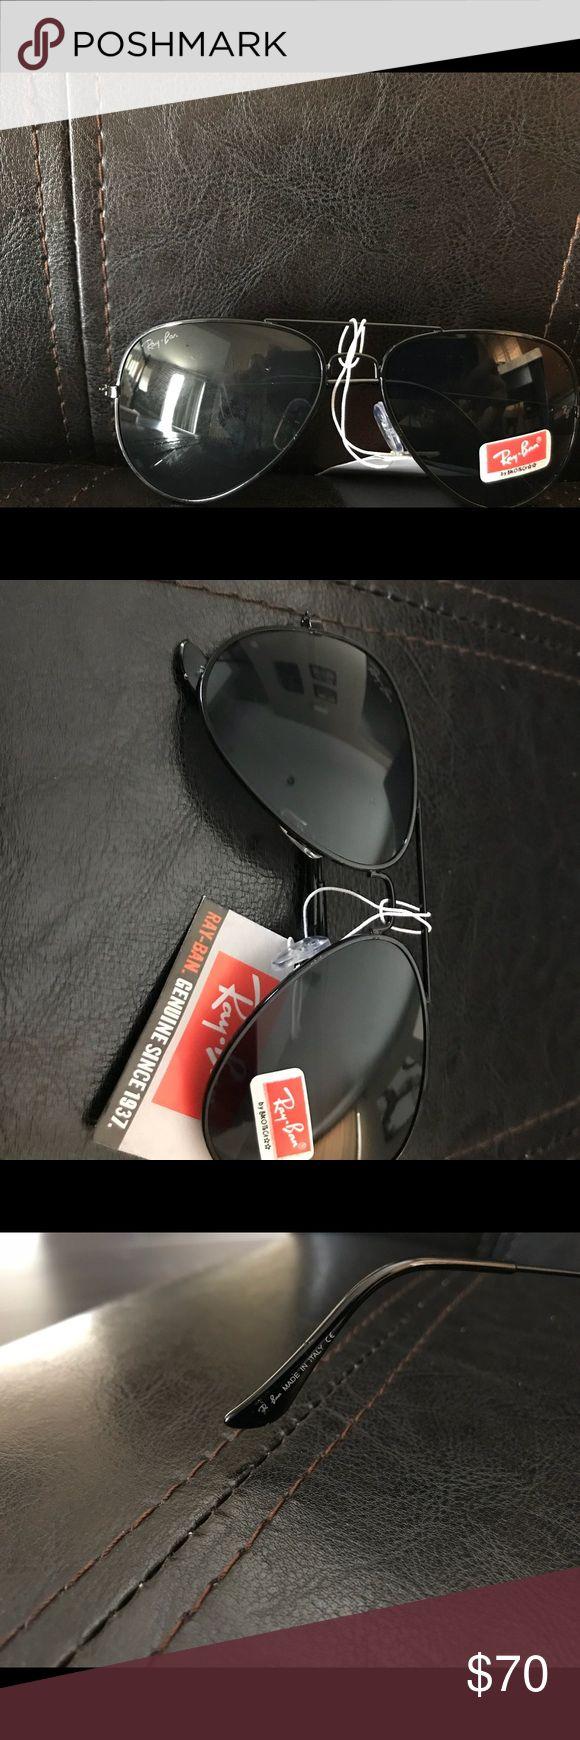 Ray-Ban Aviator Sunglasses for kids Brand New Ray-Ban Aviator Sunglasses for Kids black in color brand new no case Ray-Ban Accessories Sunglasses